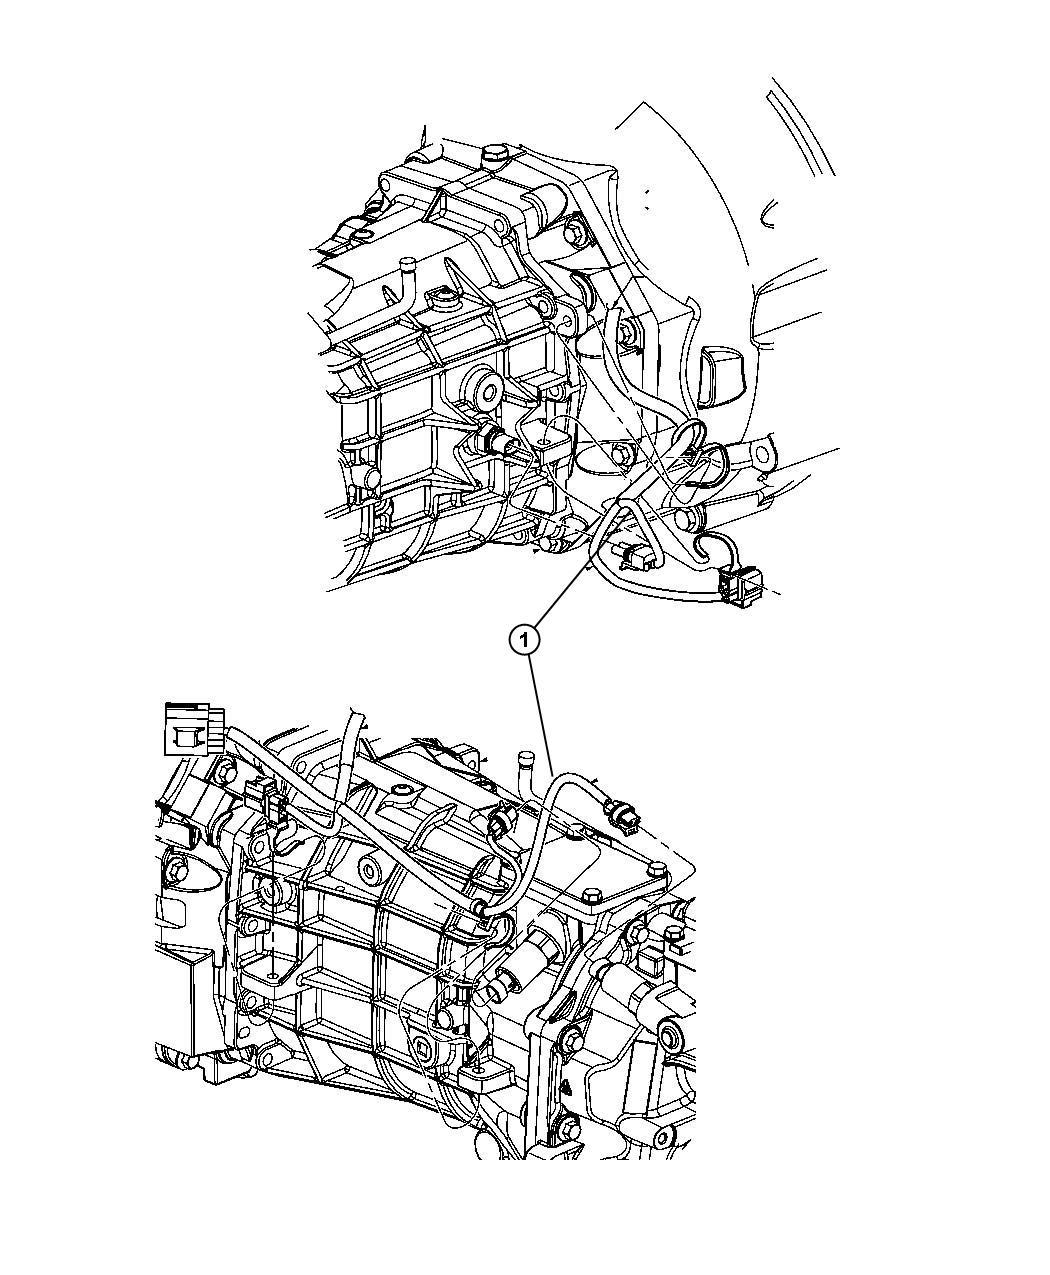 Dodge Challenger Wiring  Transmission   6-speed Manual Tremec Transmission